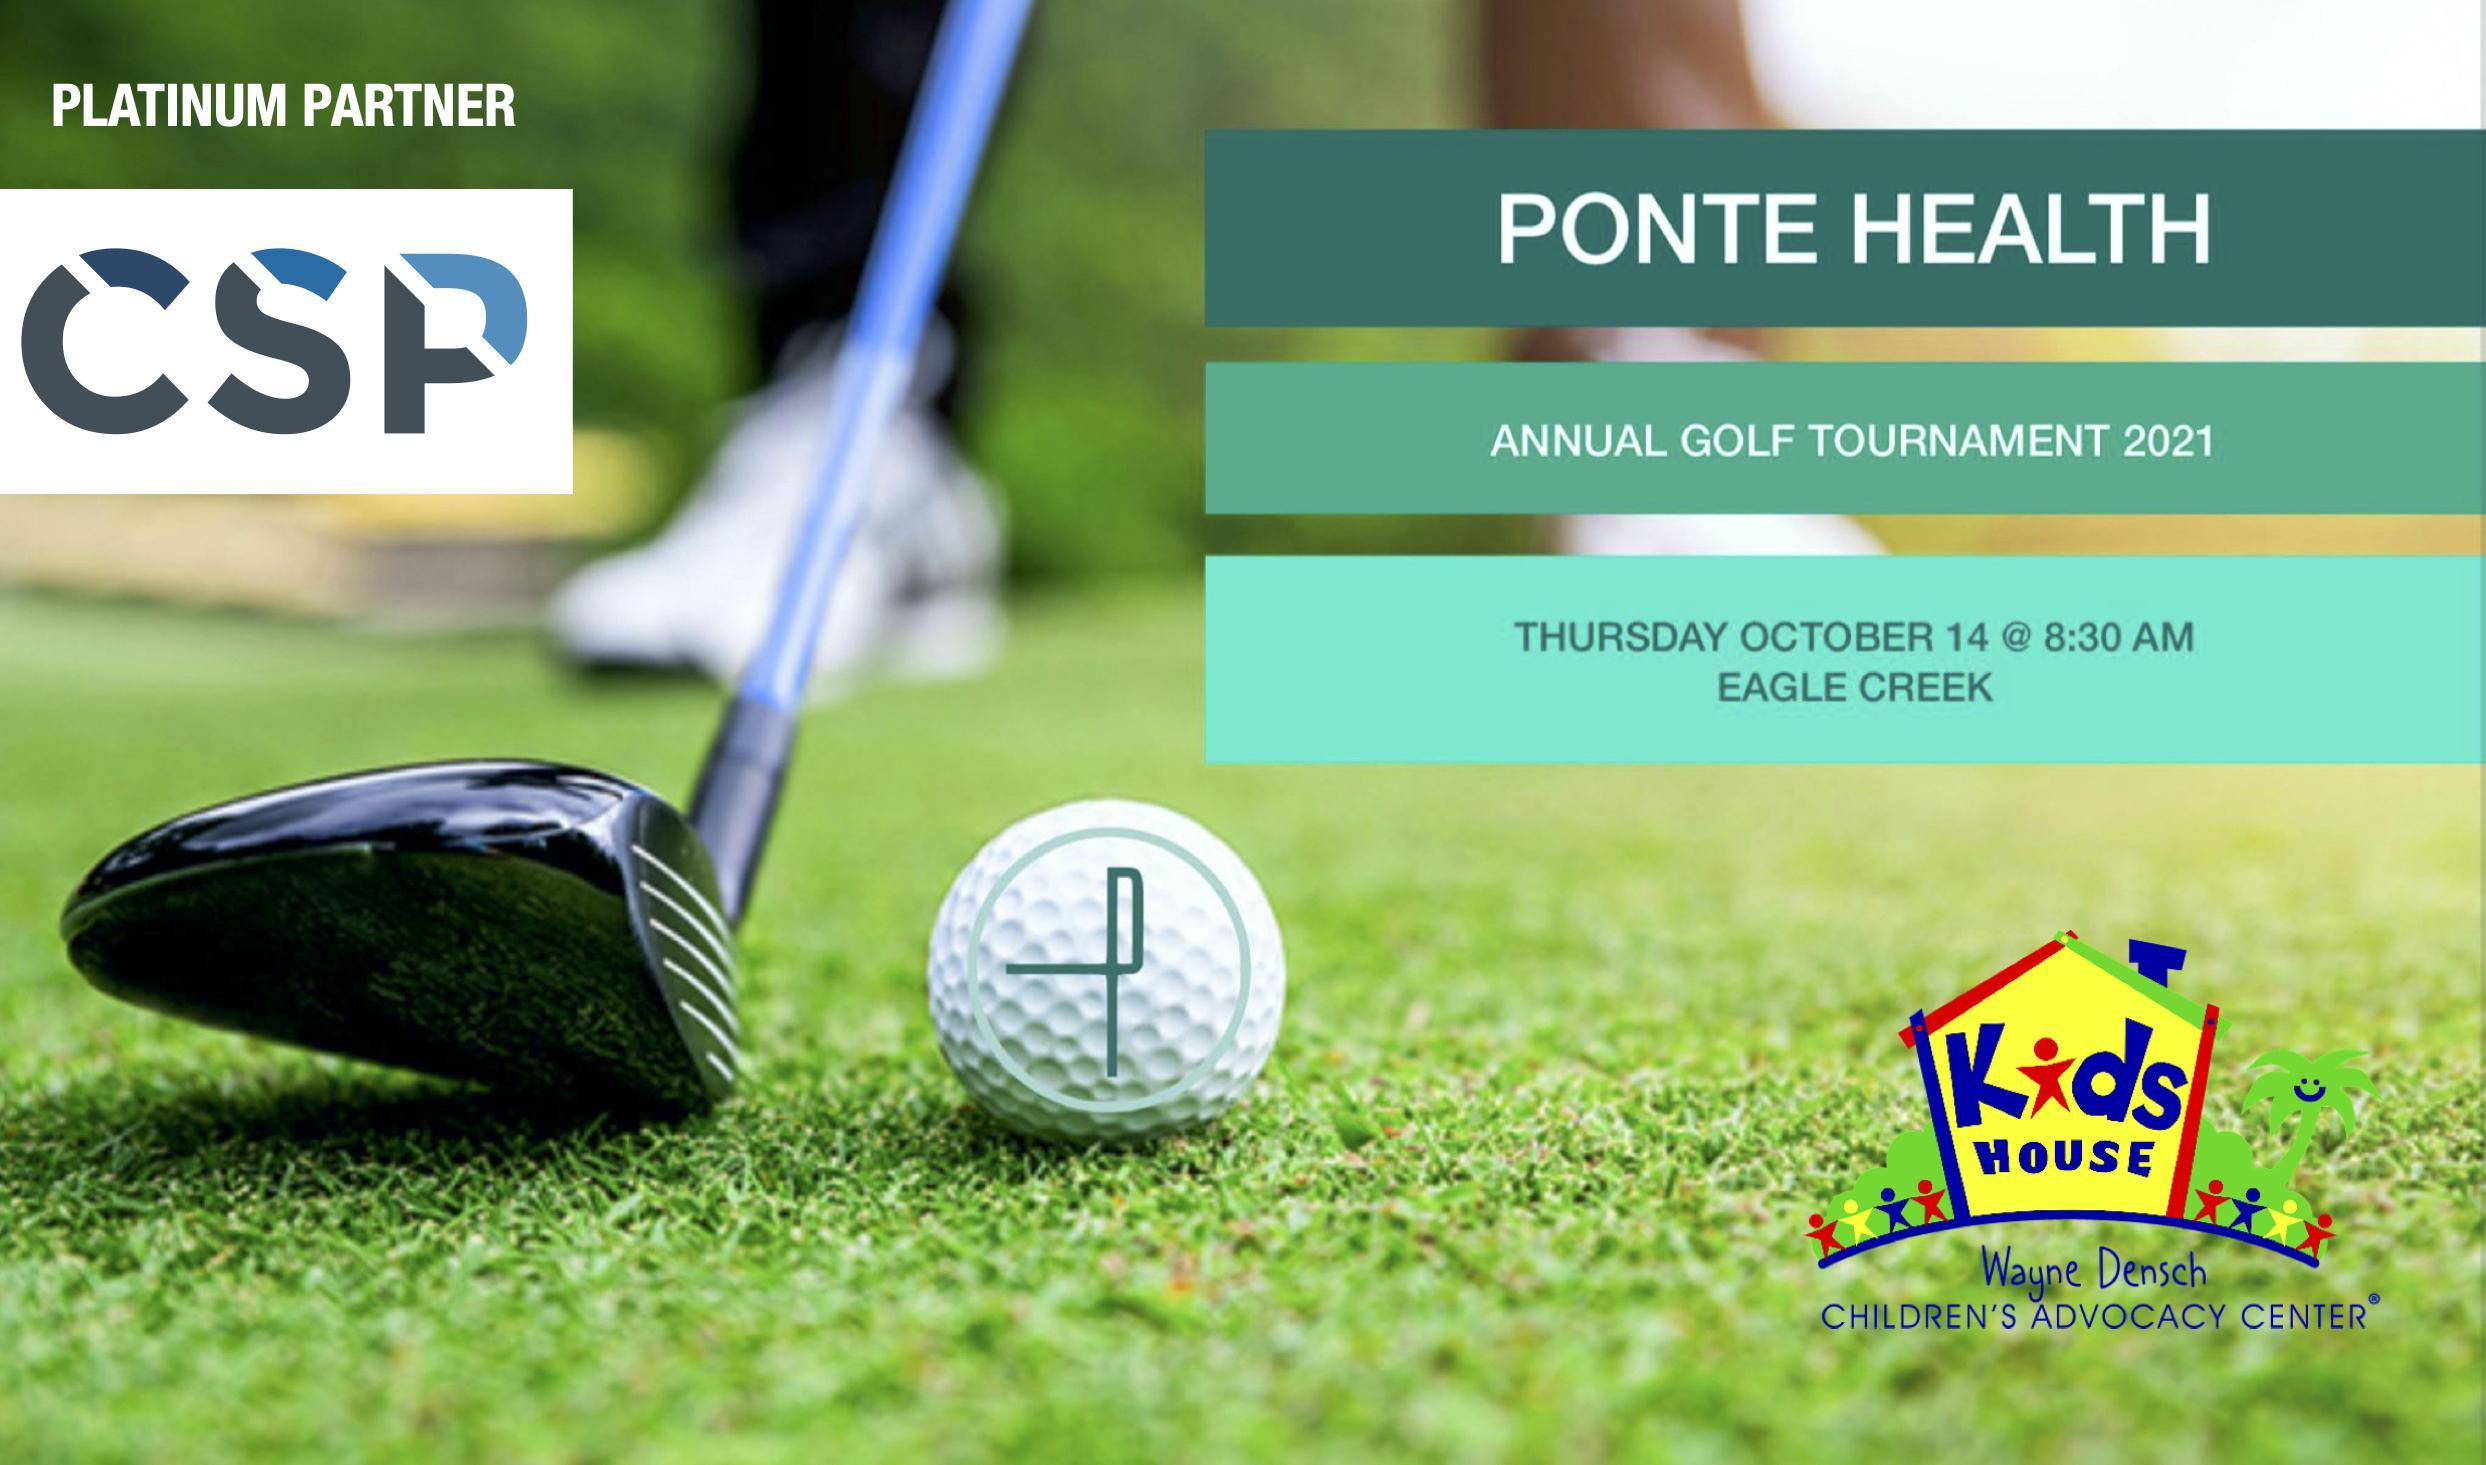 Ponte Health's 4th Annual Golf Tournament 2021